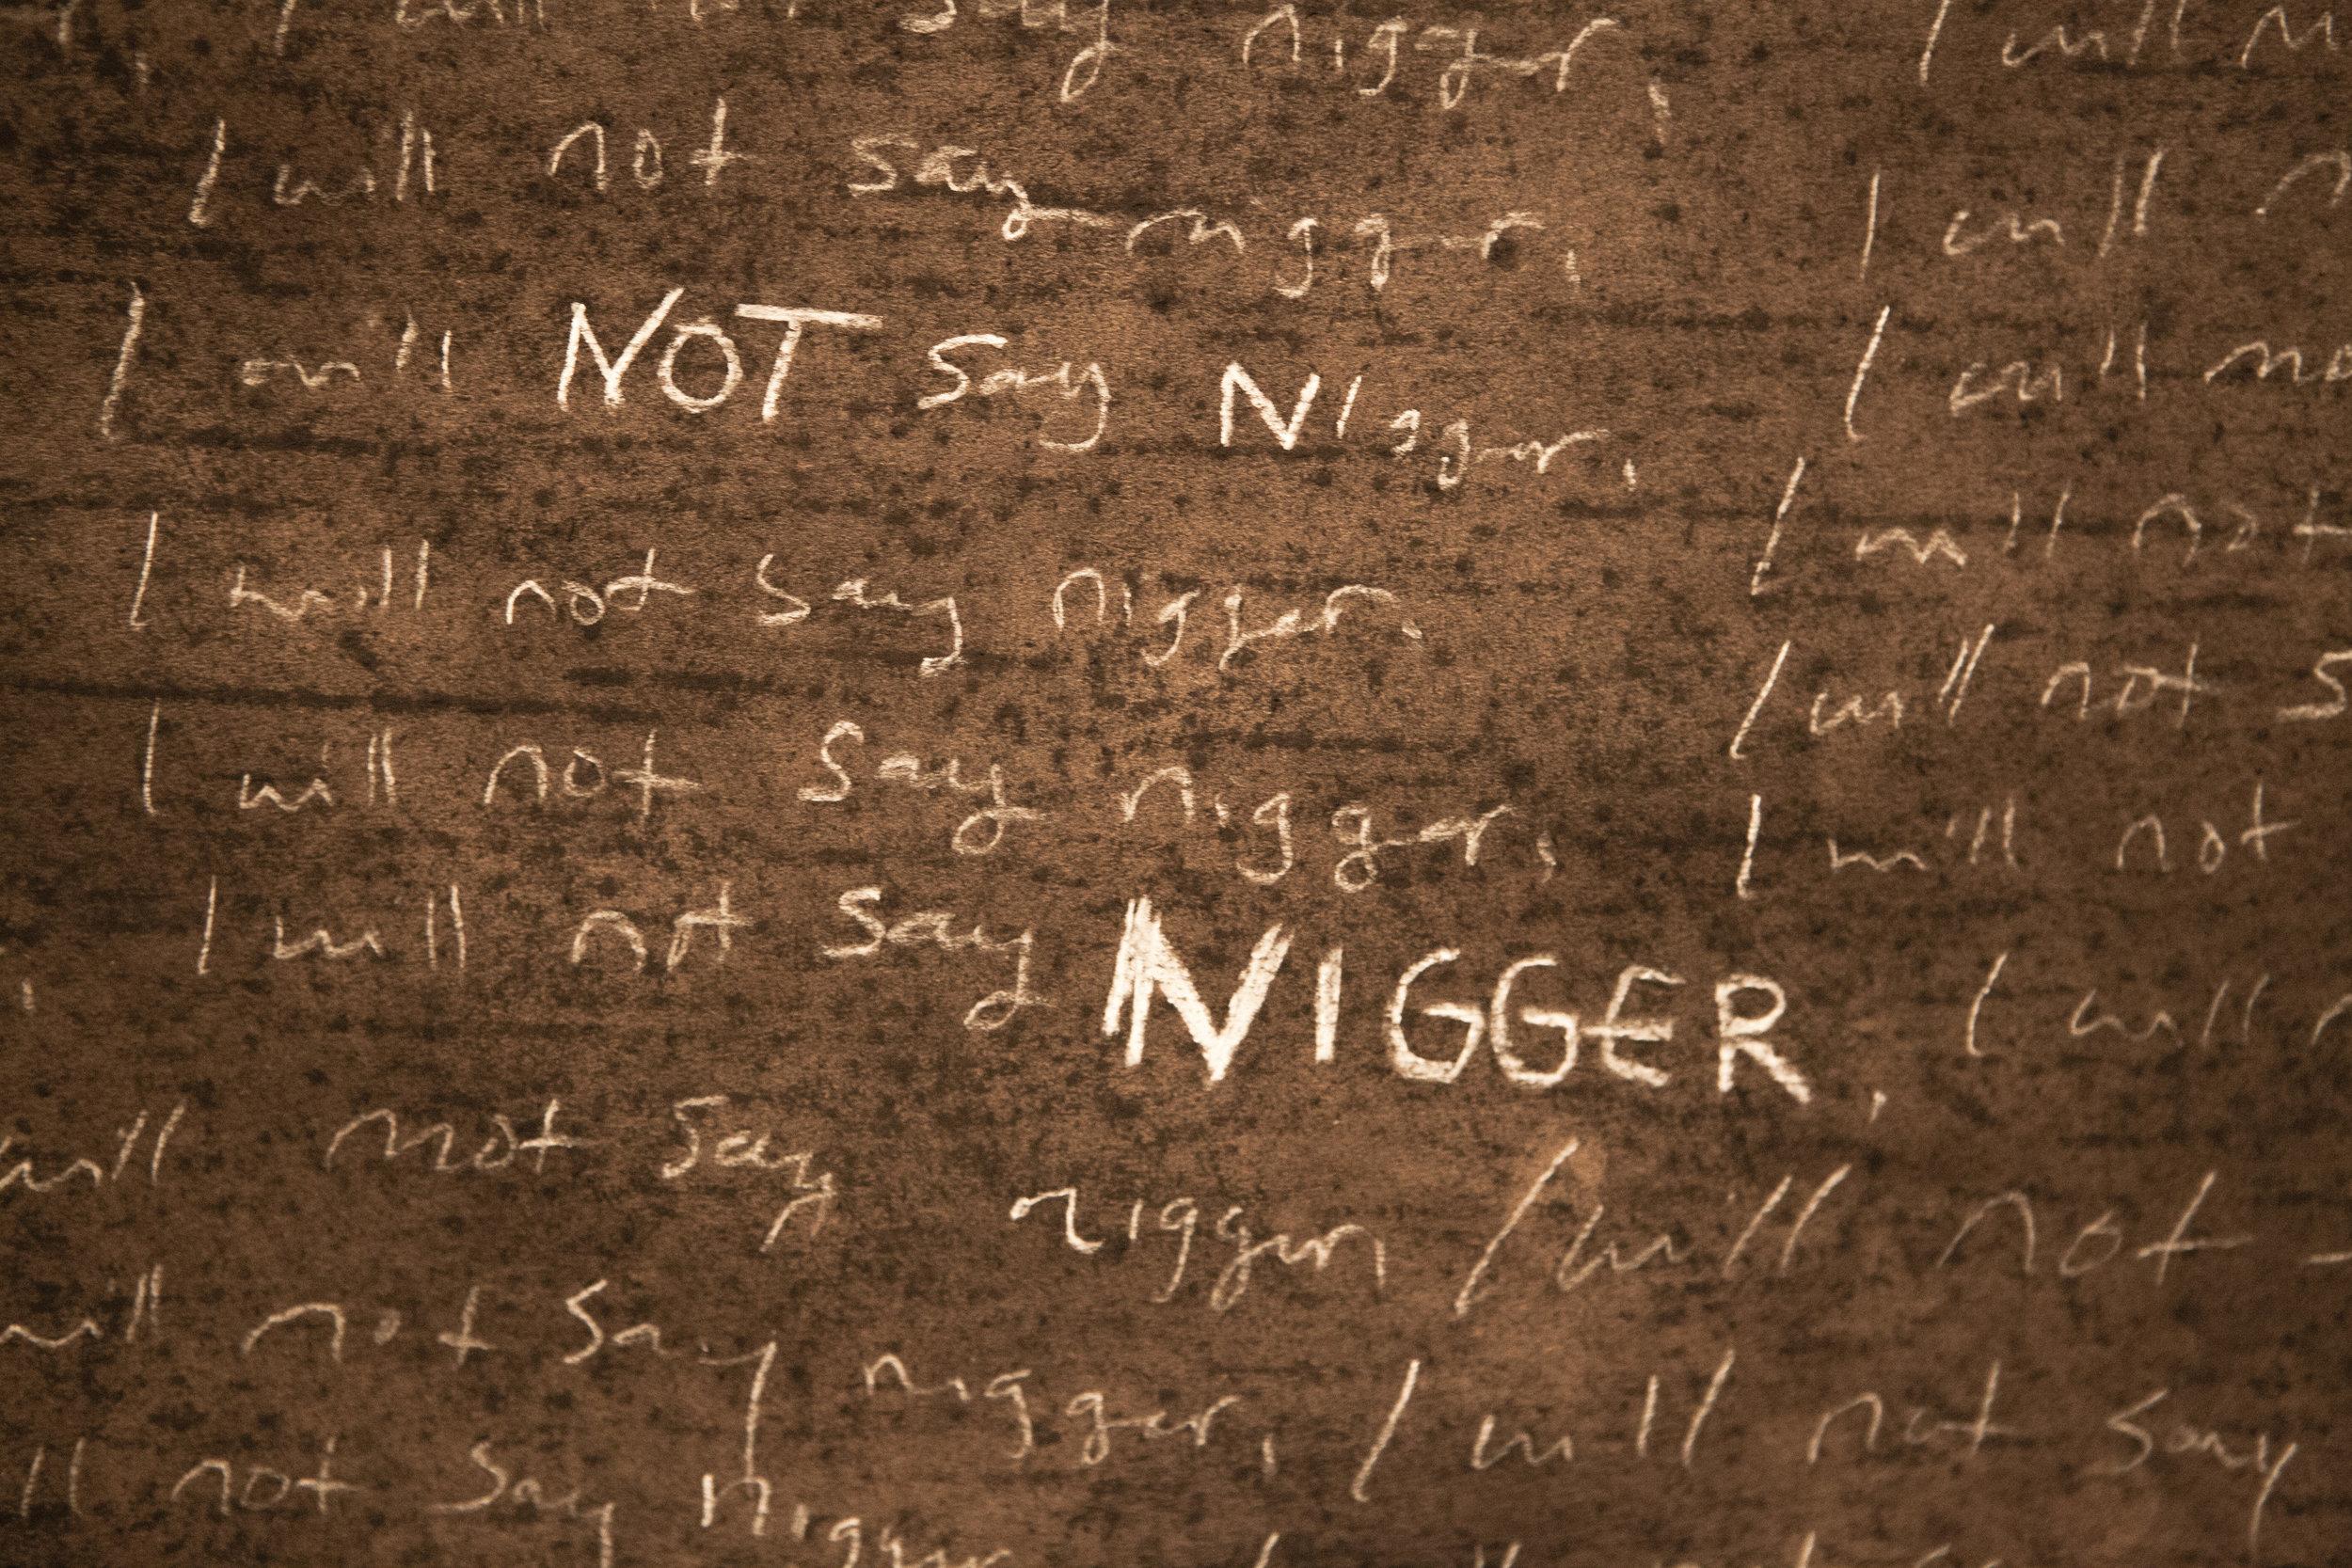 eleanor-kipping_20170210_i-will-not-say-nigger0001amy-olivia-pierce-photography-2017.jpg